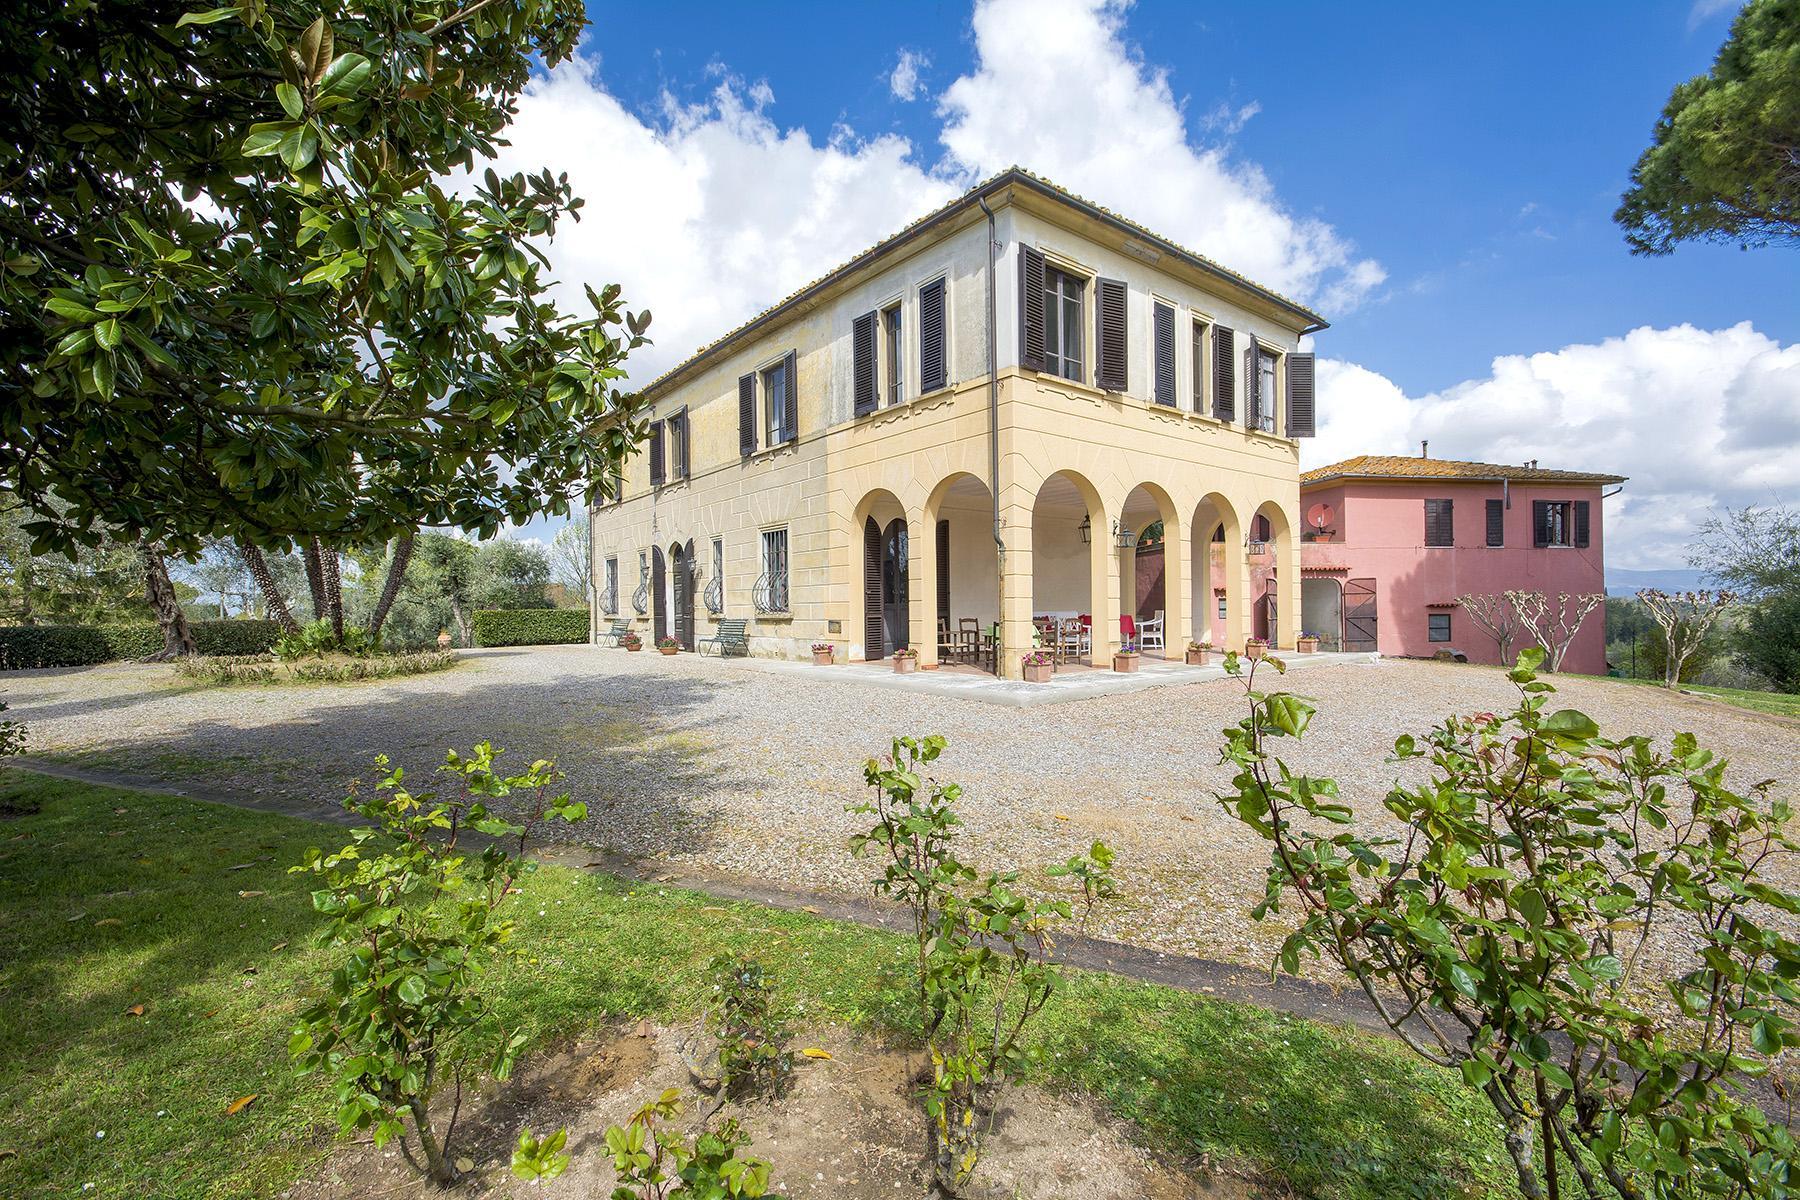 Elégante villa sur les collines toscanes - 4